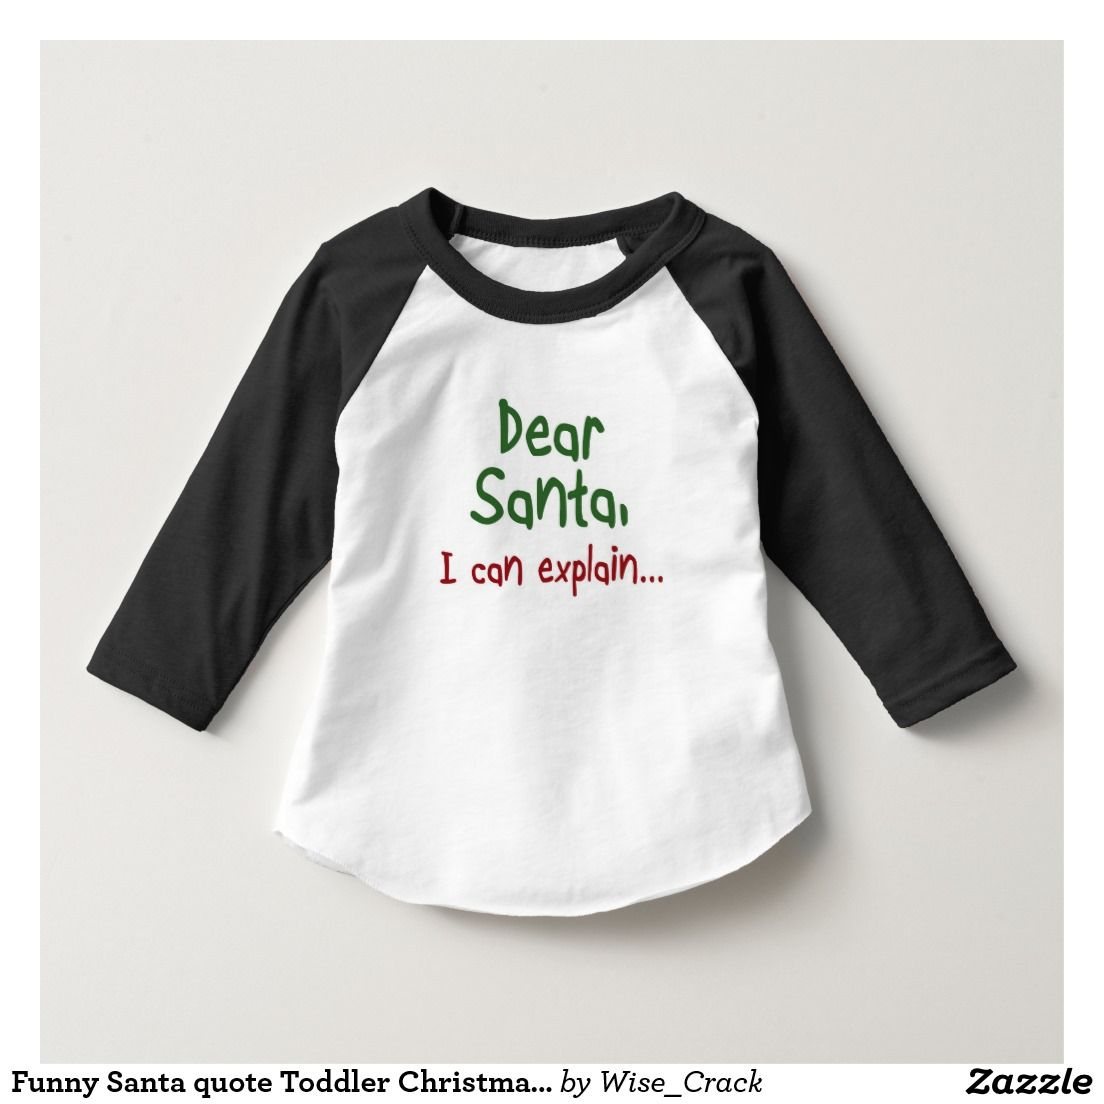 8609efb81 Funny Santa quote Toddler Christmas kids clothing T-Shirt | Zazzle ...